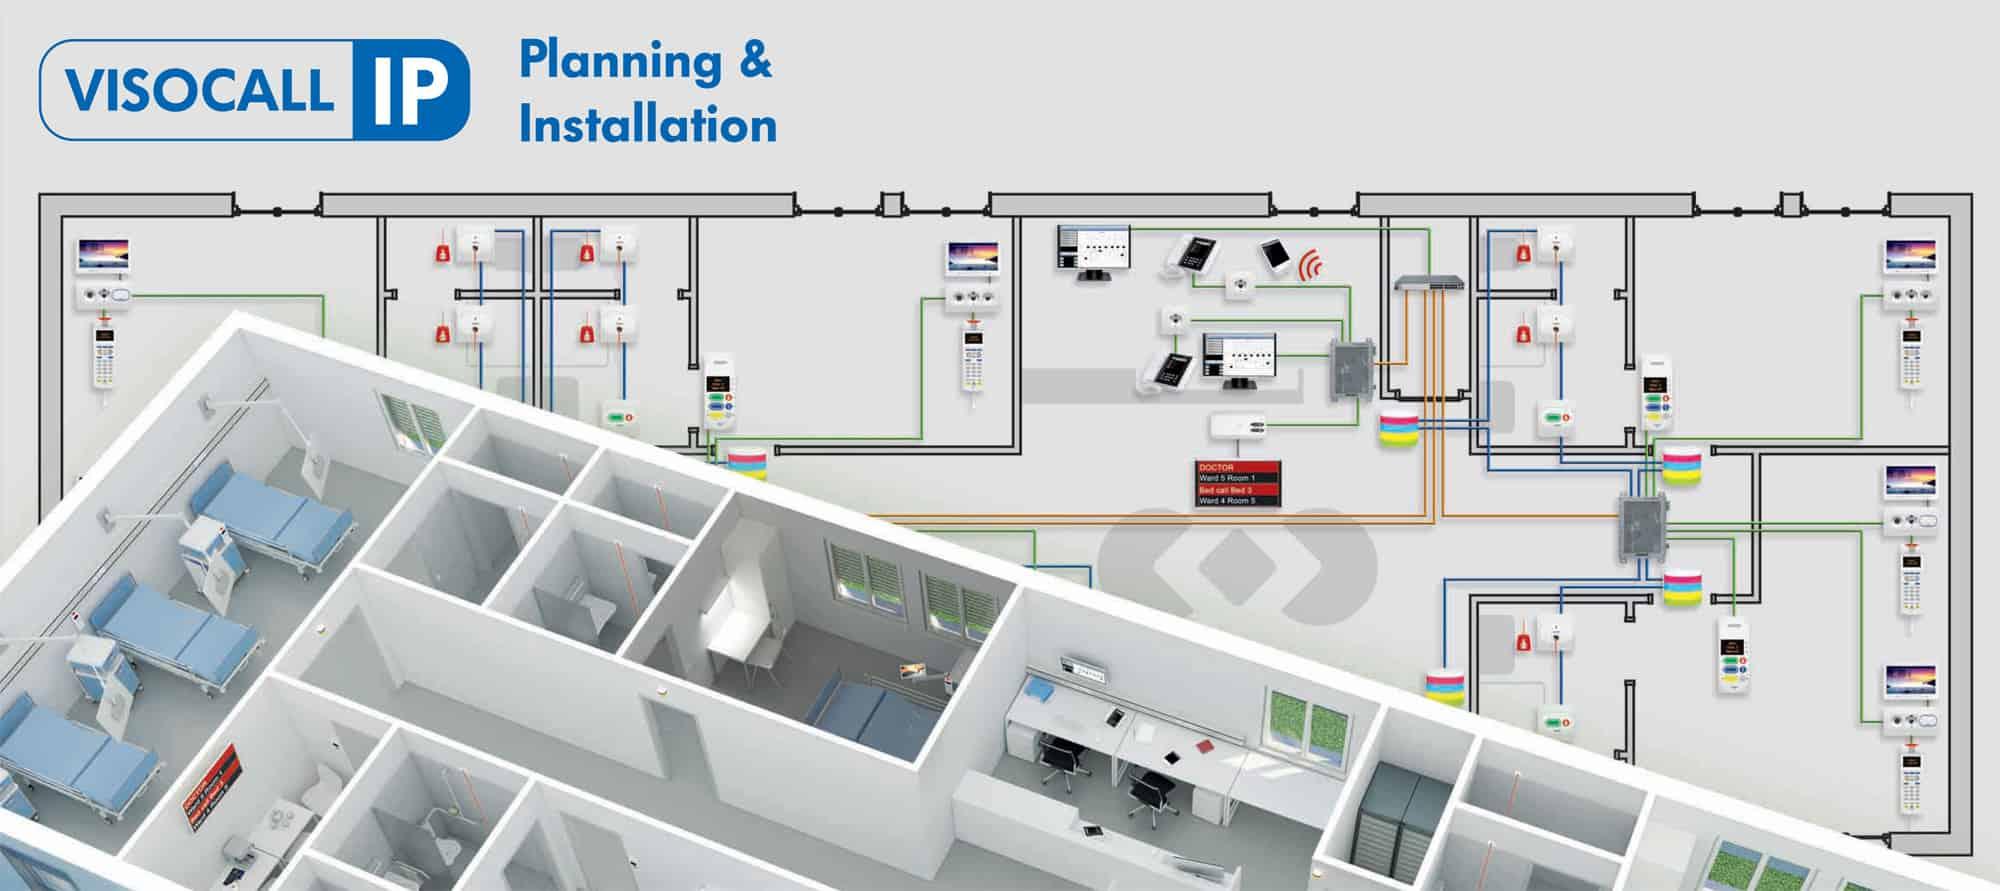 VISOCALL IP Nurse Call Systems Planning and Installation